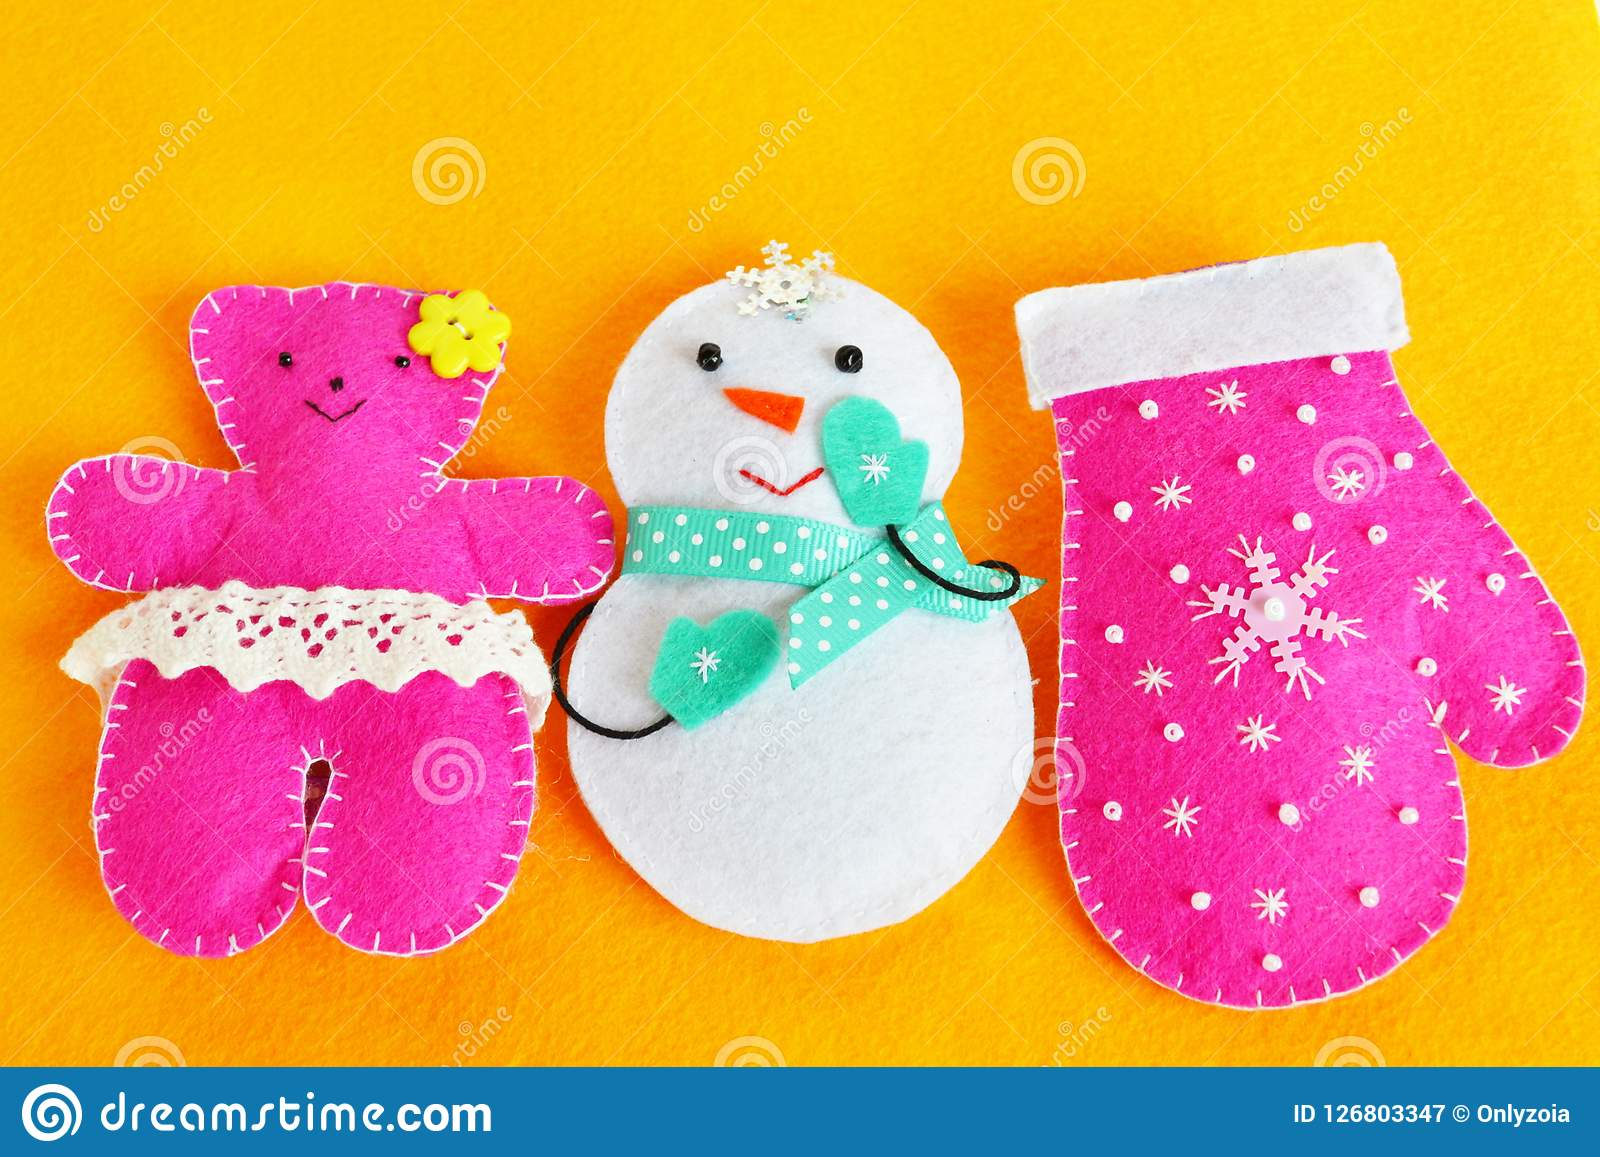 Handmade Felt Christmas Toys Handmade Kids Crafts Christmas Decorations Stock Image Image Of Needle Cyan 126803347